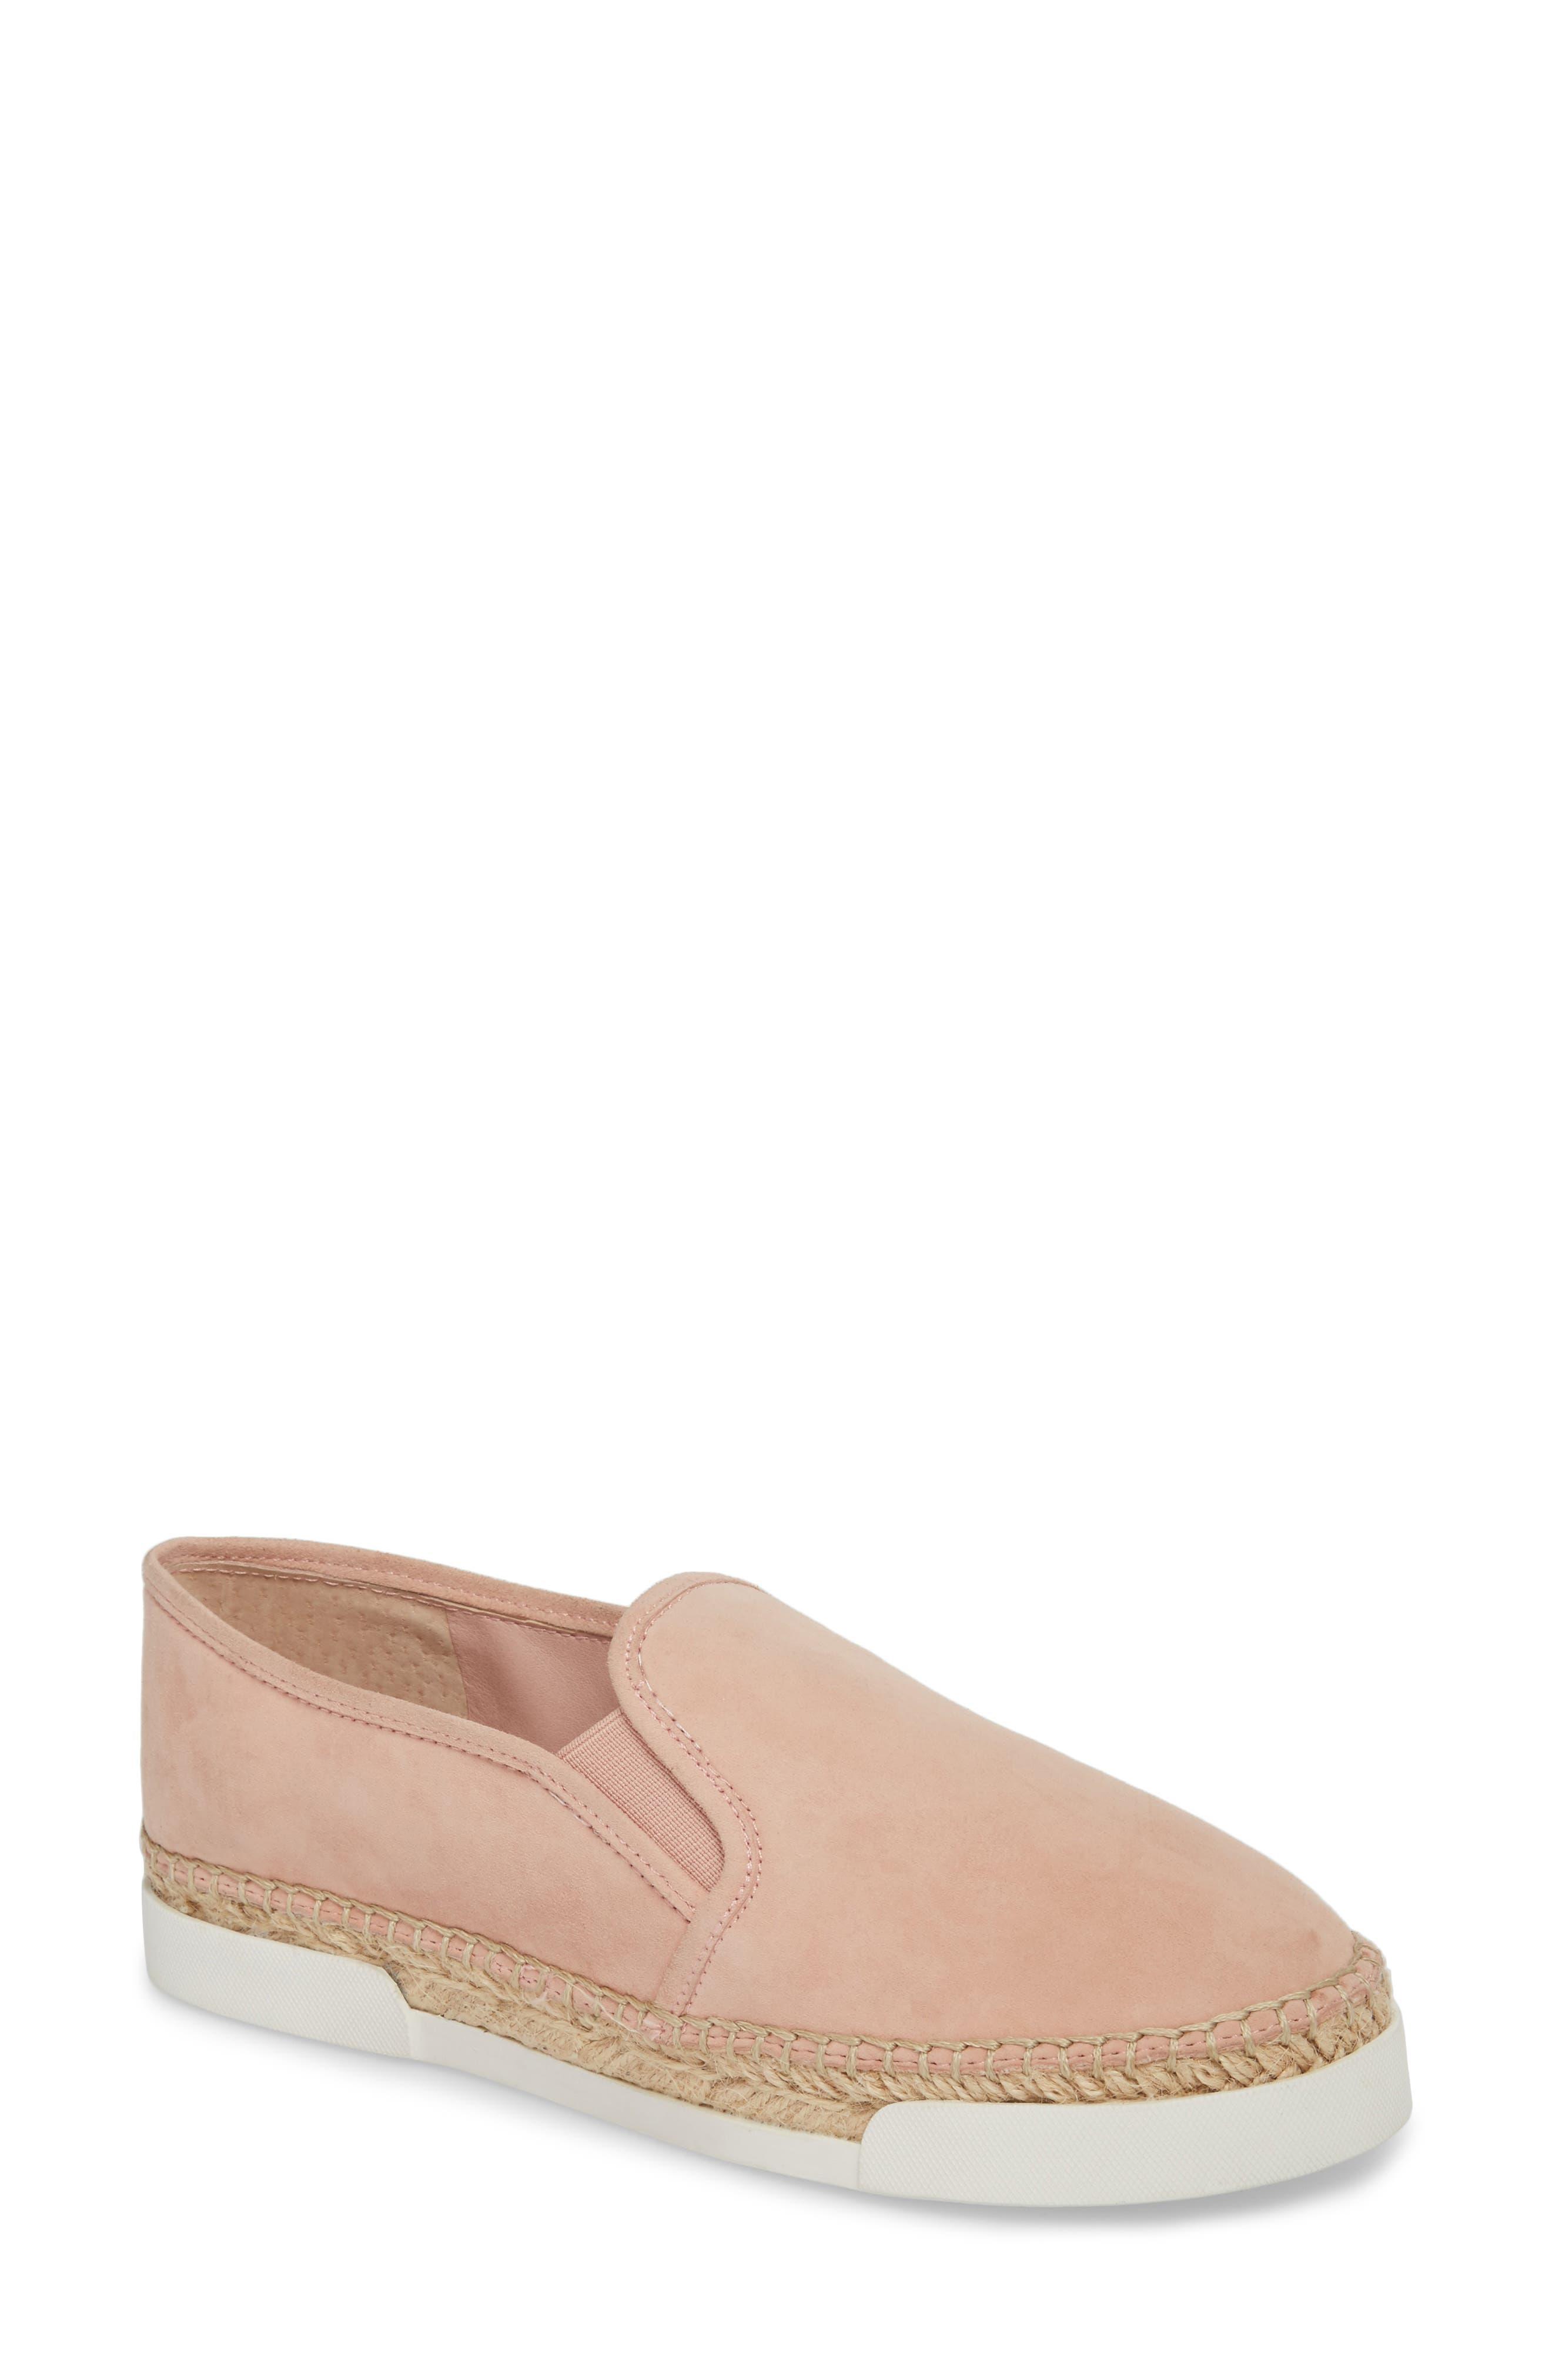 Vince Camuto Tambie Slip-On Sneaker (Women)